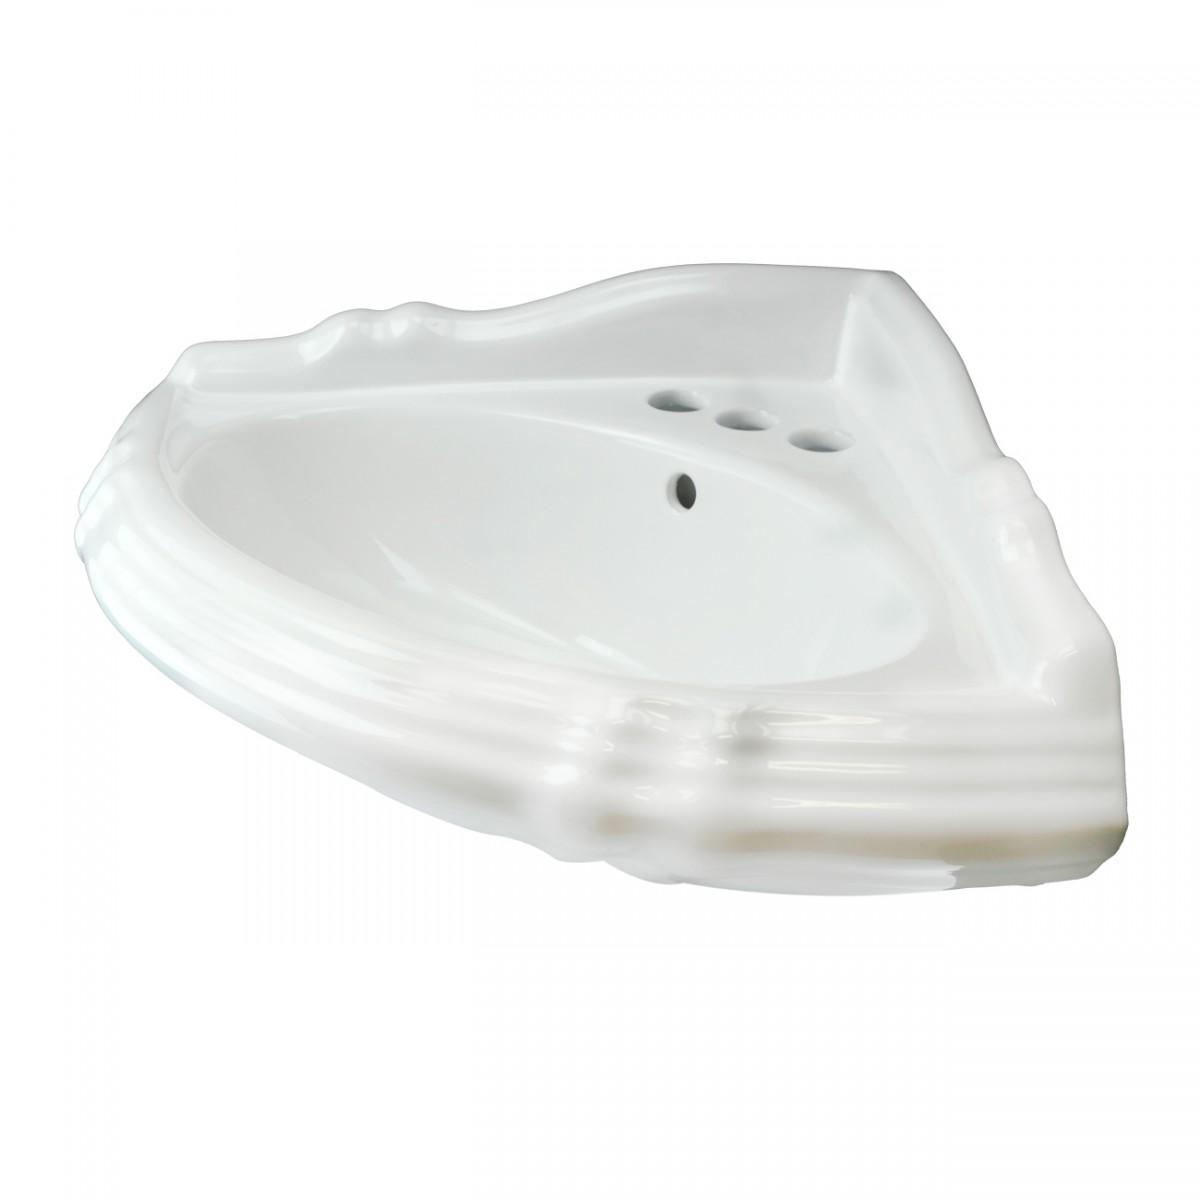 Pedestal Corner Sink White Porcelain Sheffield Basin Only Corner Sinks Corner Sink Corner Bathroom Sink